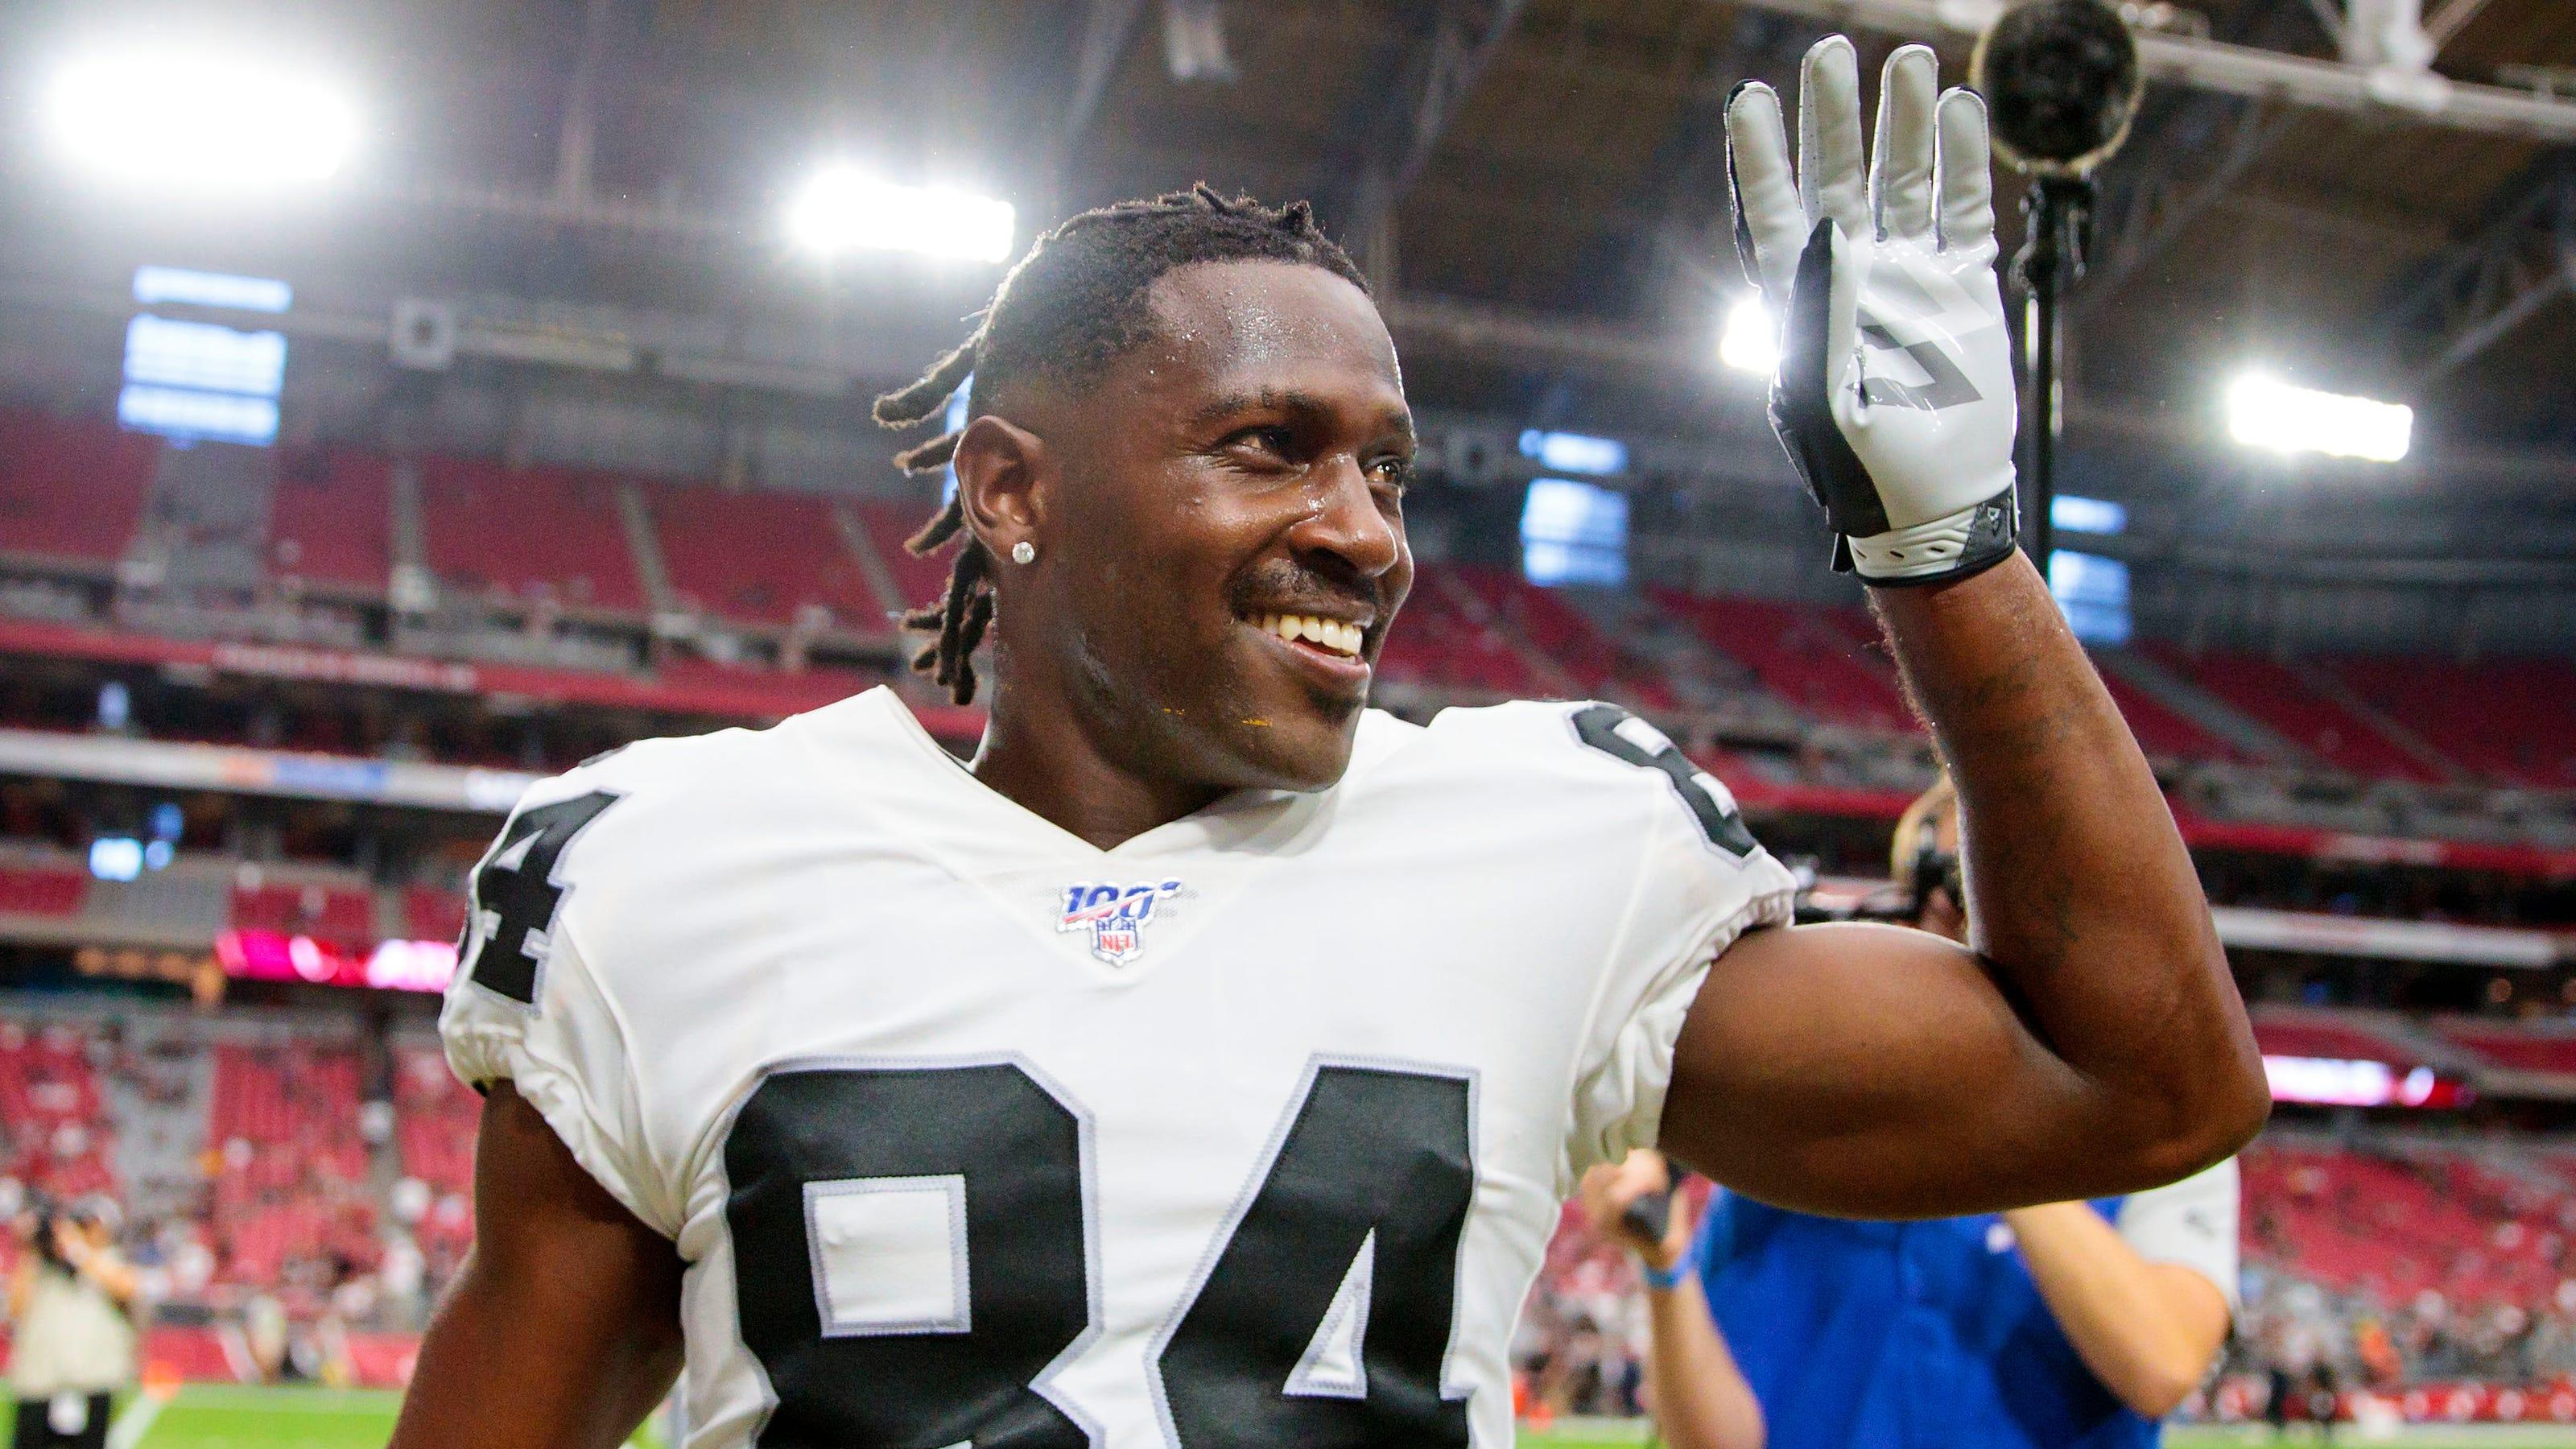 Antonio Brown Fans Make Bill Belichick Jokes After Raiders Release Wr